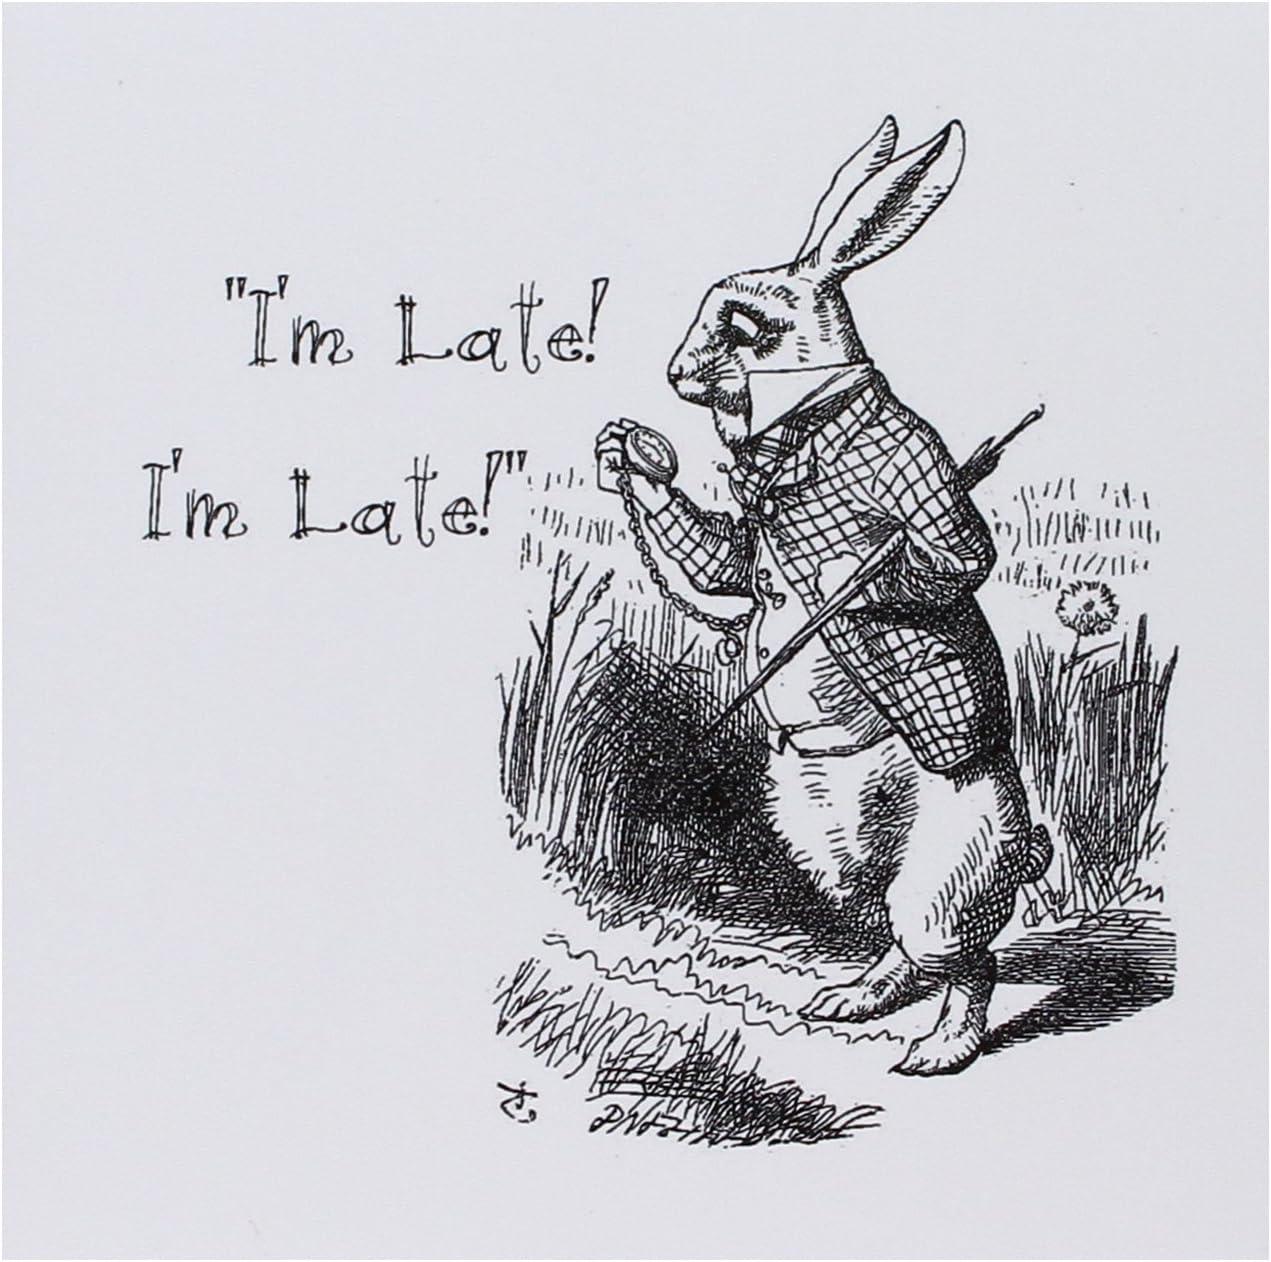 Amazon.com : 3dRose Alice in Wonderland White Rabbit Im Late - John Tenniel  Illustration, Greeting Cards, Set of 6 (gc_193791_1) : Office Products